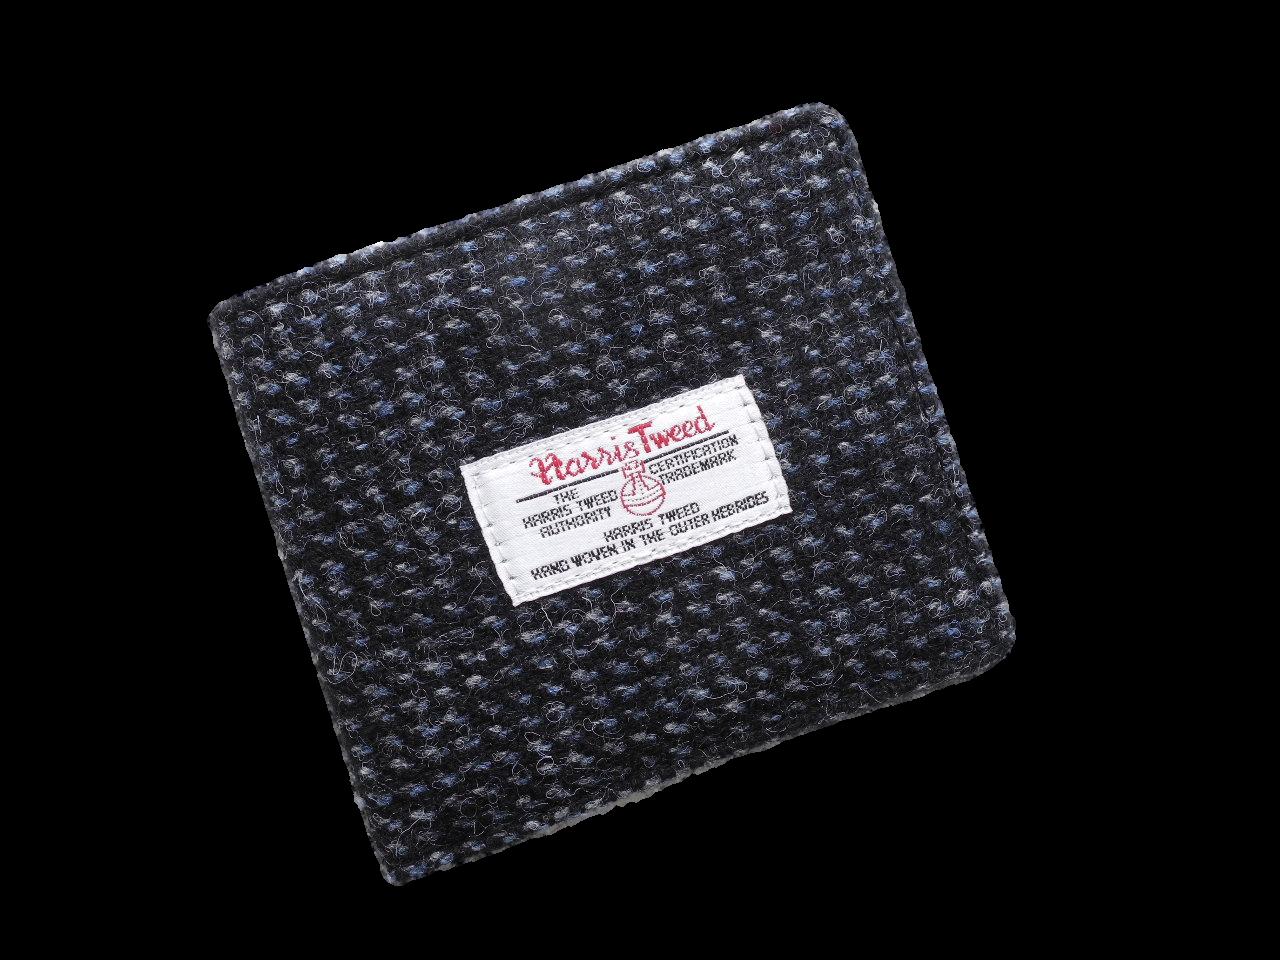 scottish gents mens gift wallet harris tweed black grey check